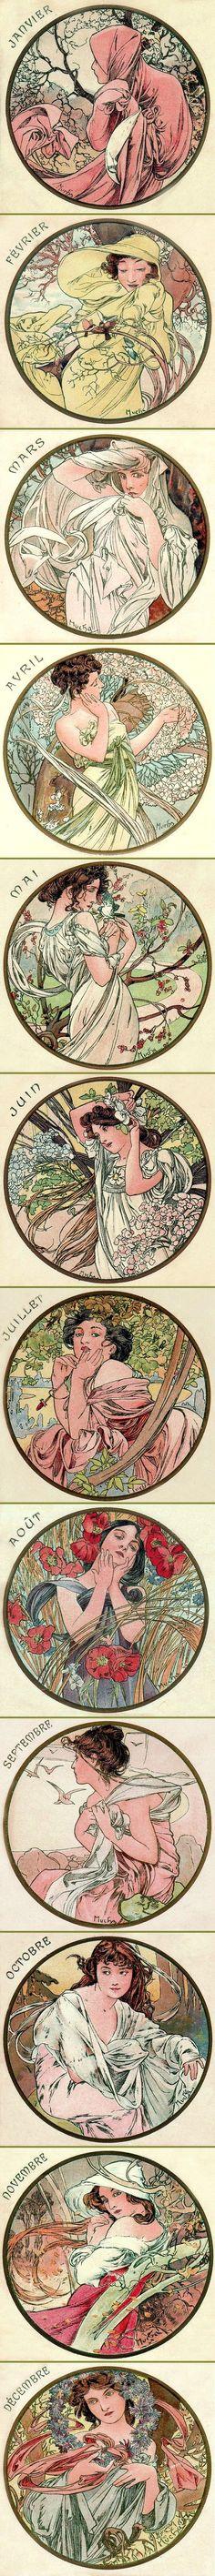 Alphonse Mucha - The Months (1899):